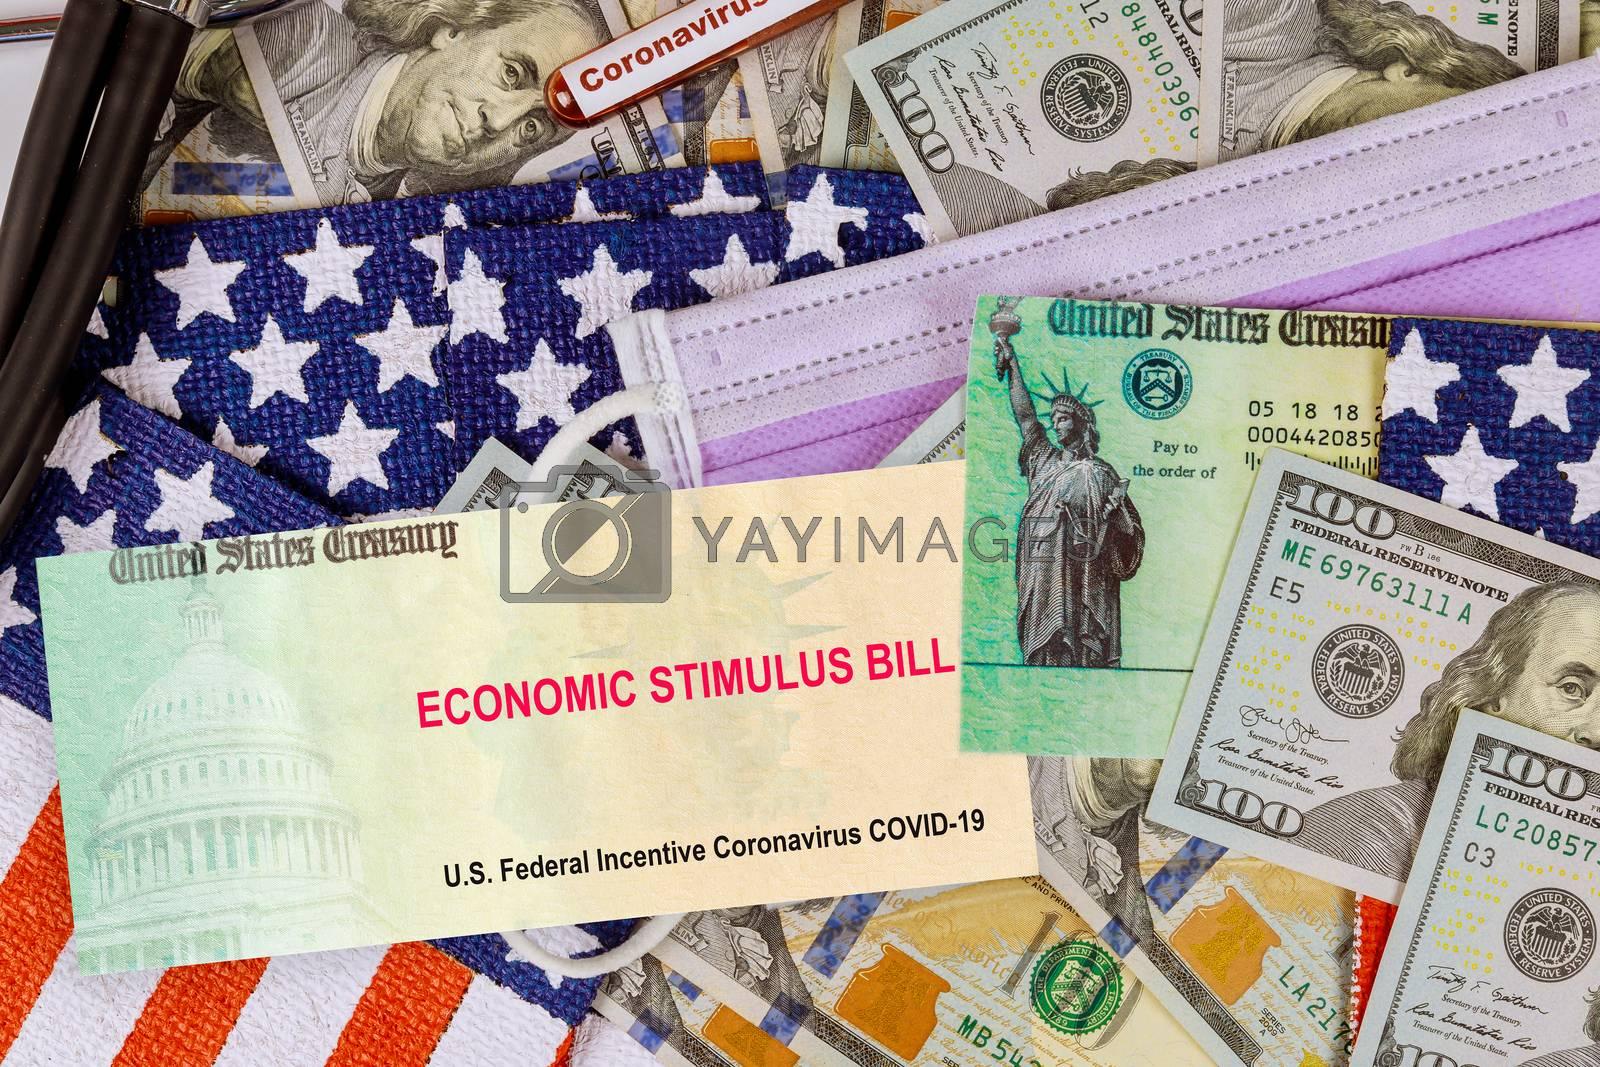 Covid 19 lockdown stimulus bill Global pandemic US dollar cash banknote on American flag